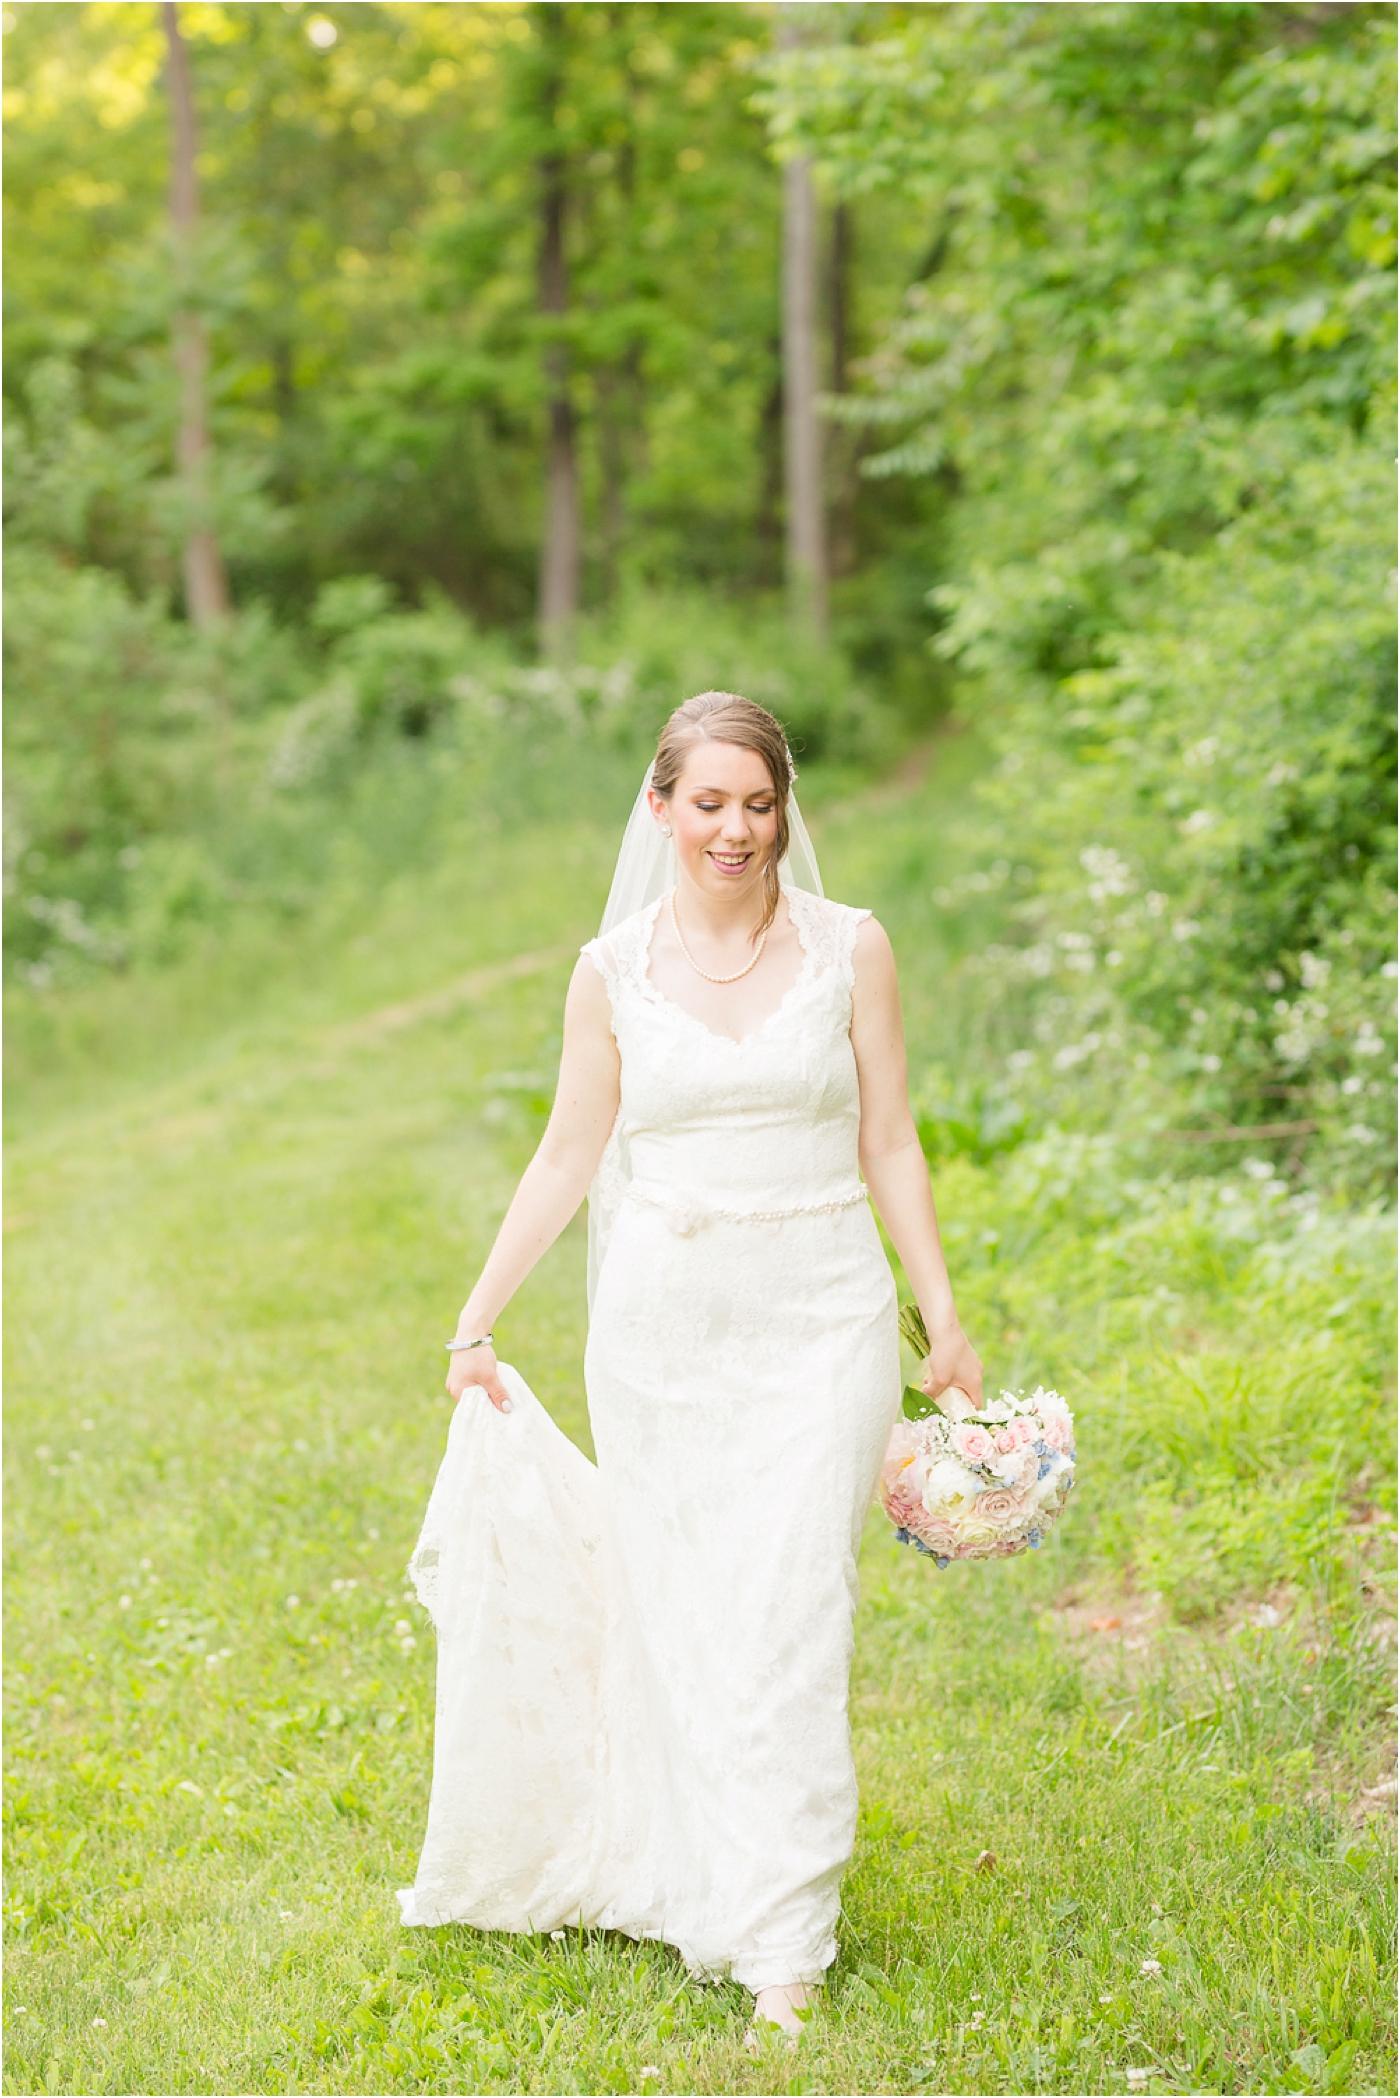 Gettysburg-lodges-wedding-photos-77.jpg